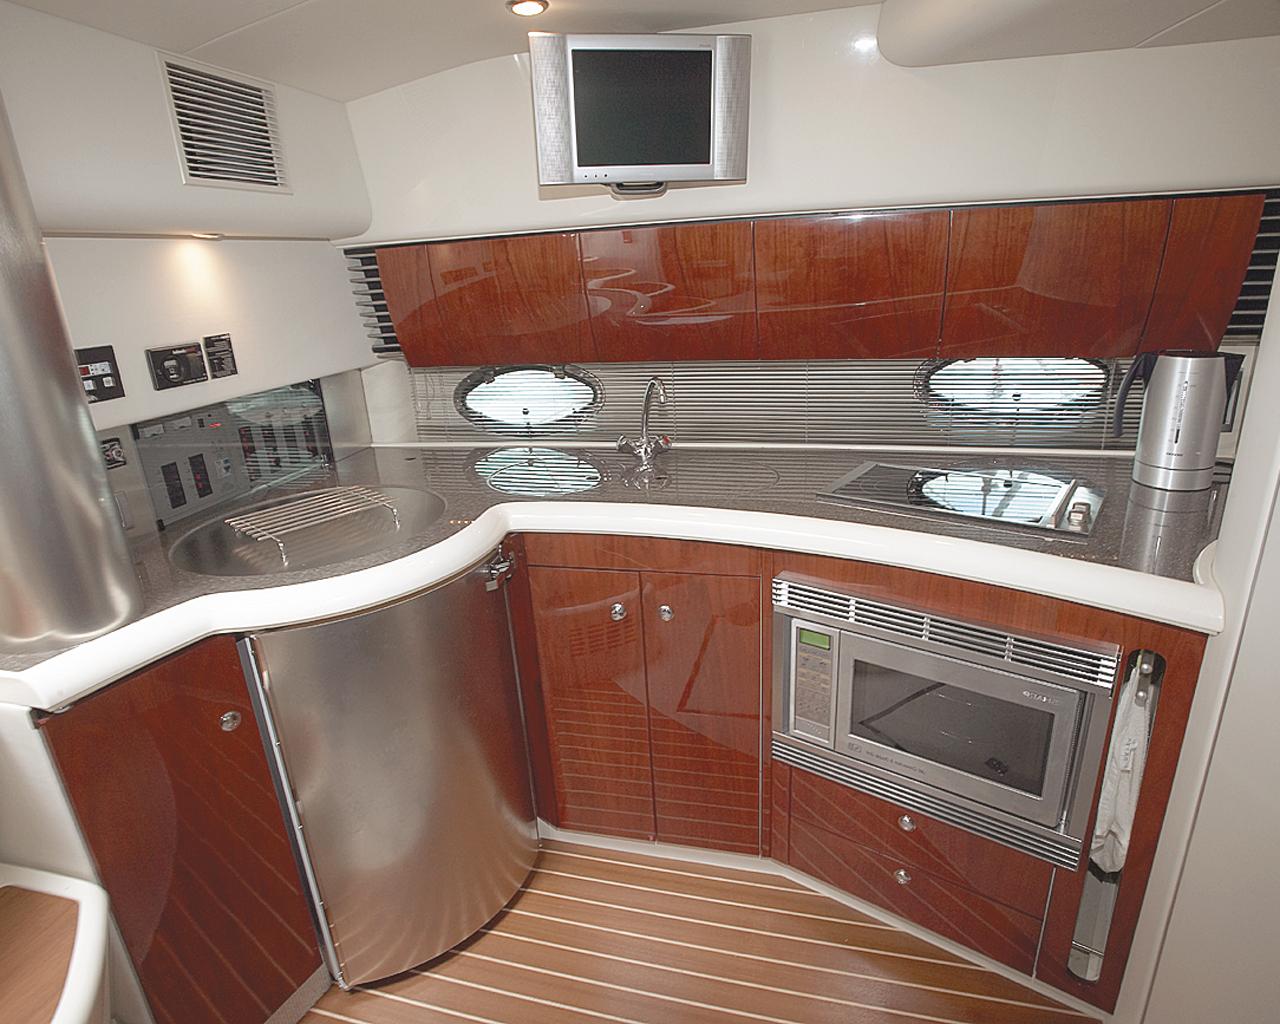 Page not found | Home Interior Design, Kitchen and Bathroom Designs ...